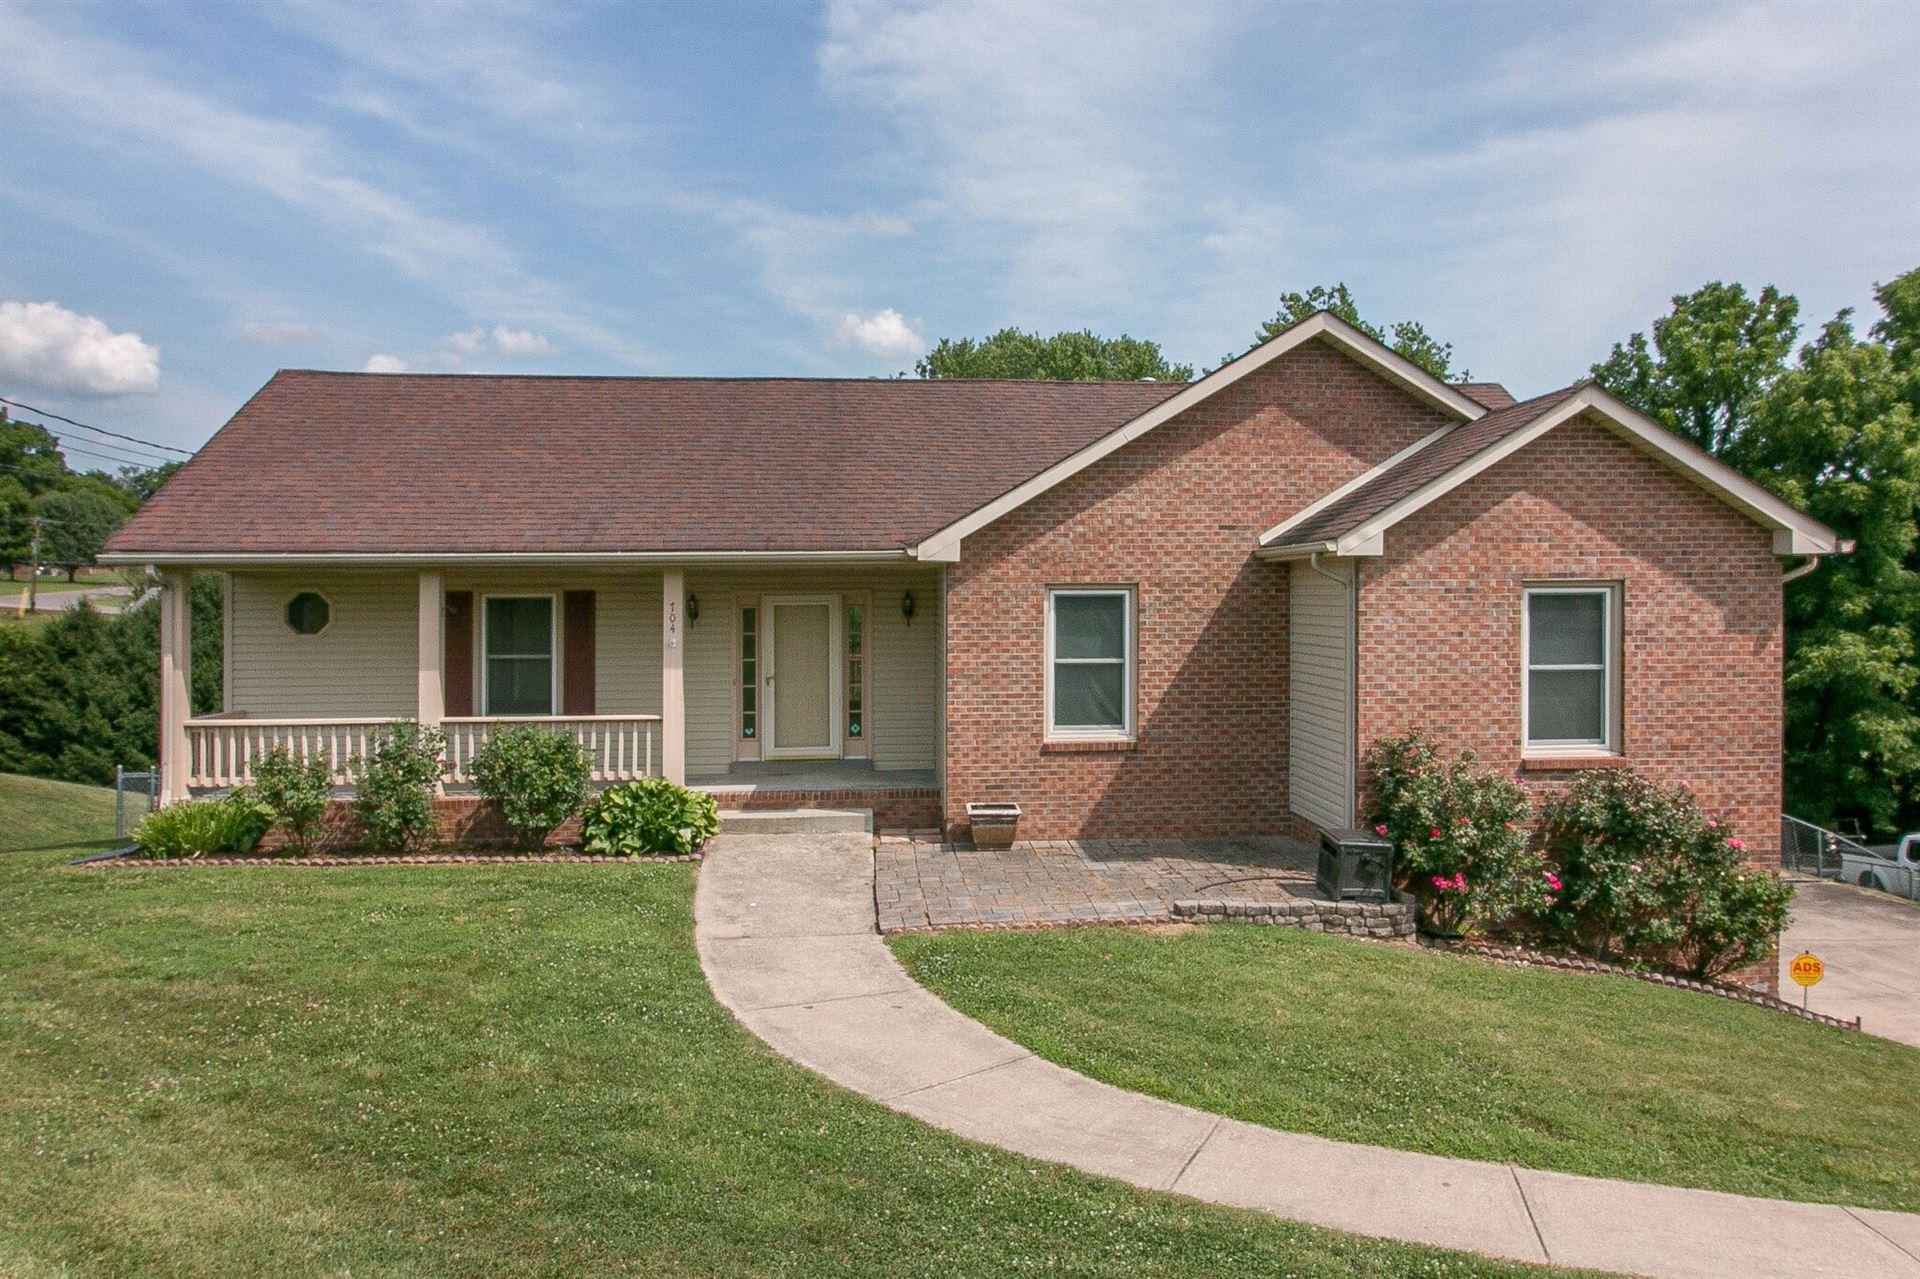 704 Jace Dr, Clarksville, TN 37040 - MLS#: 2265867